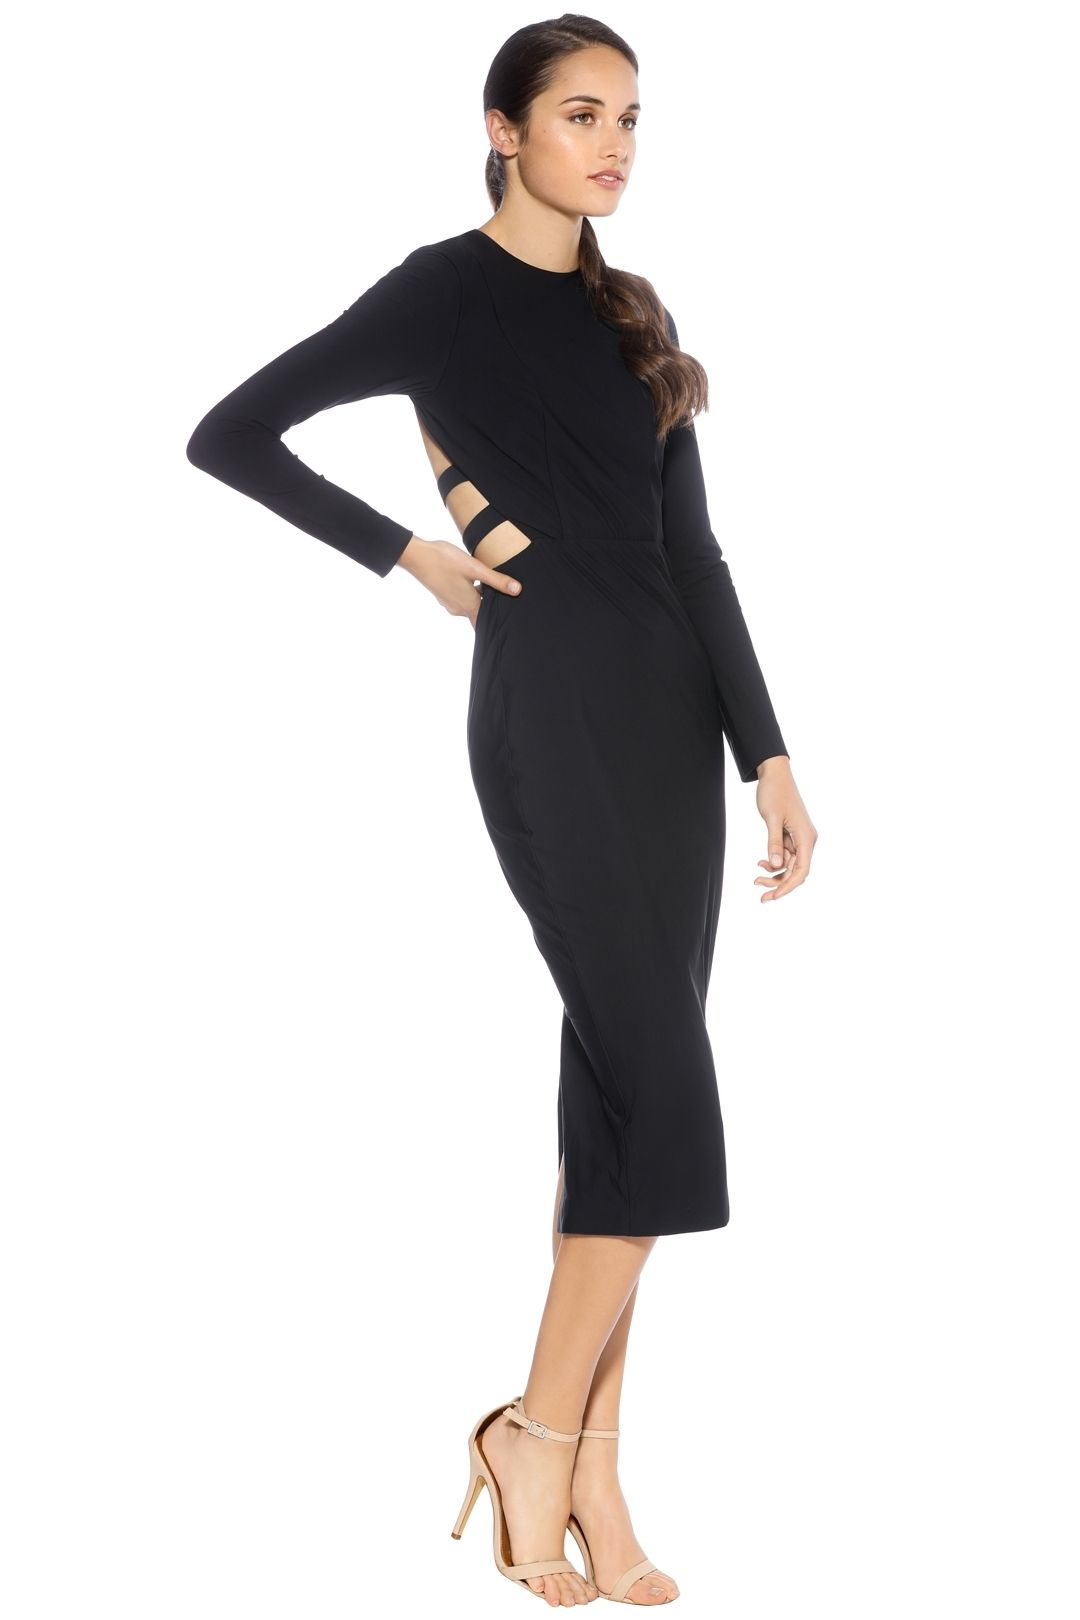 Misha Collection - Demetria Dress - Navy - Side